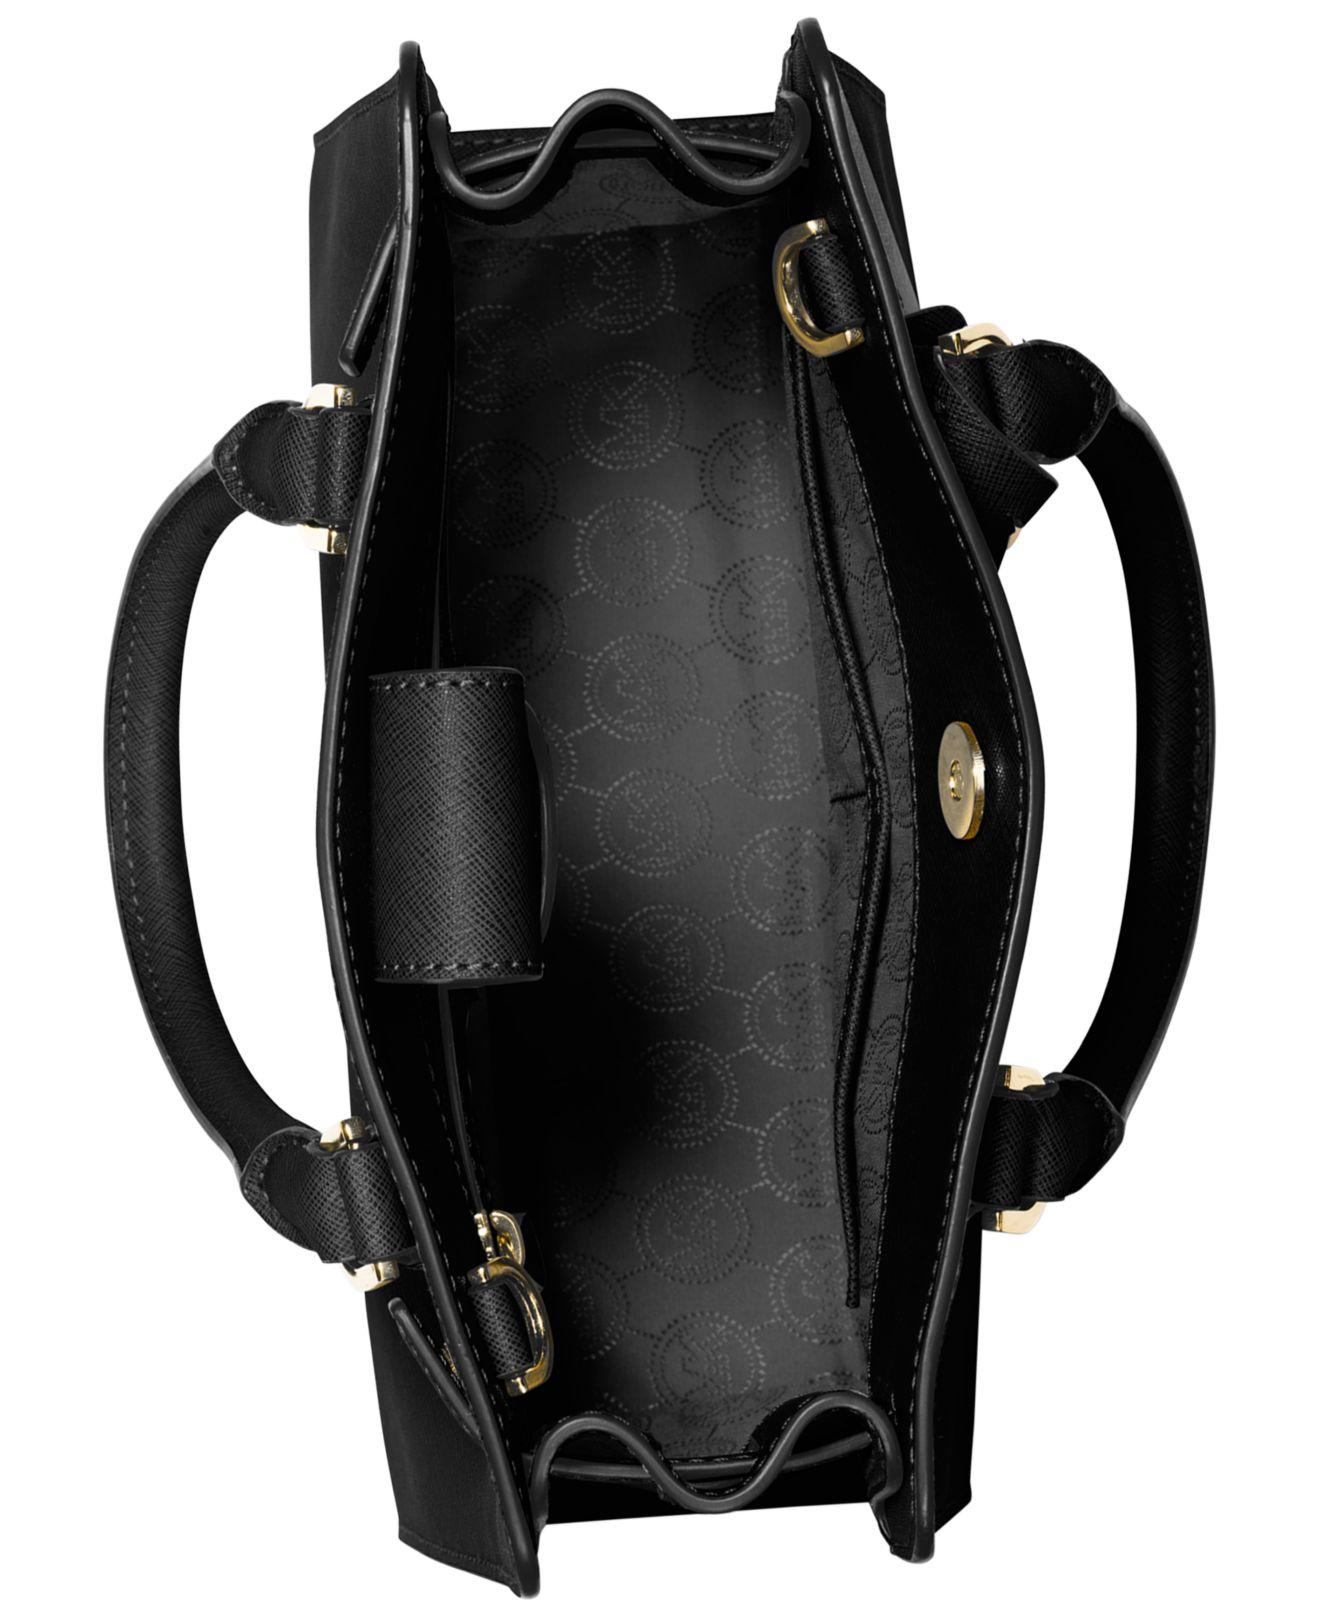 81f5378a965e ... clearance lyst michael kors michael dillon small satchel in black b97a4  6a9d7